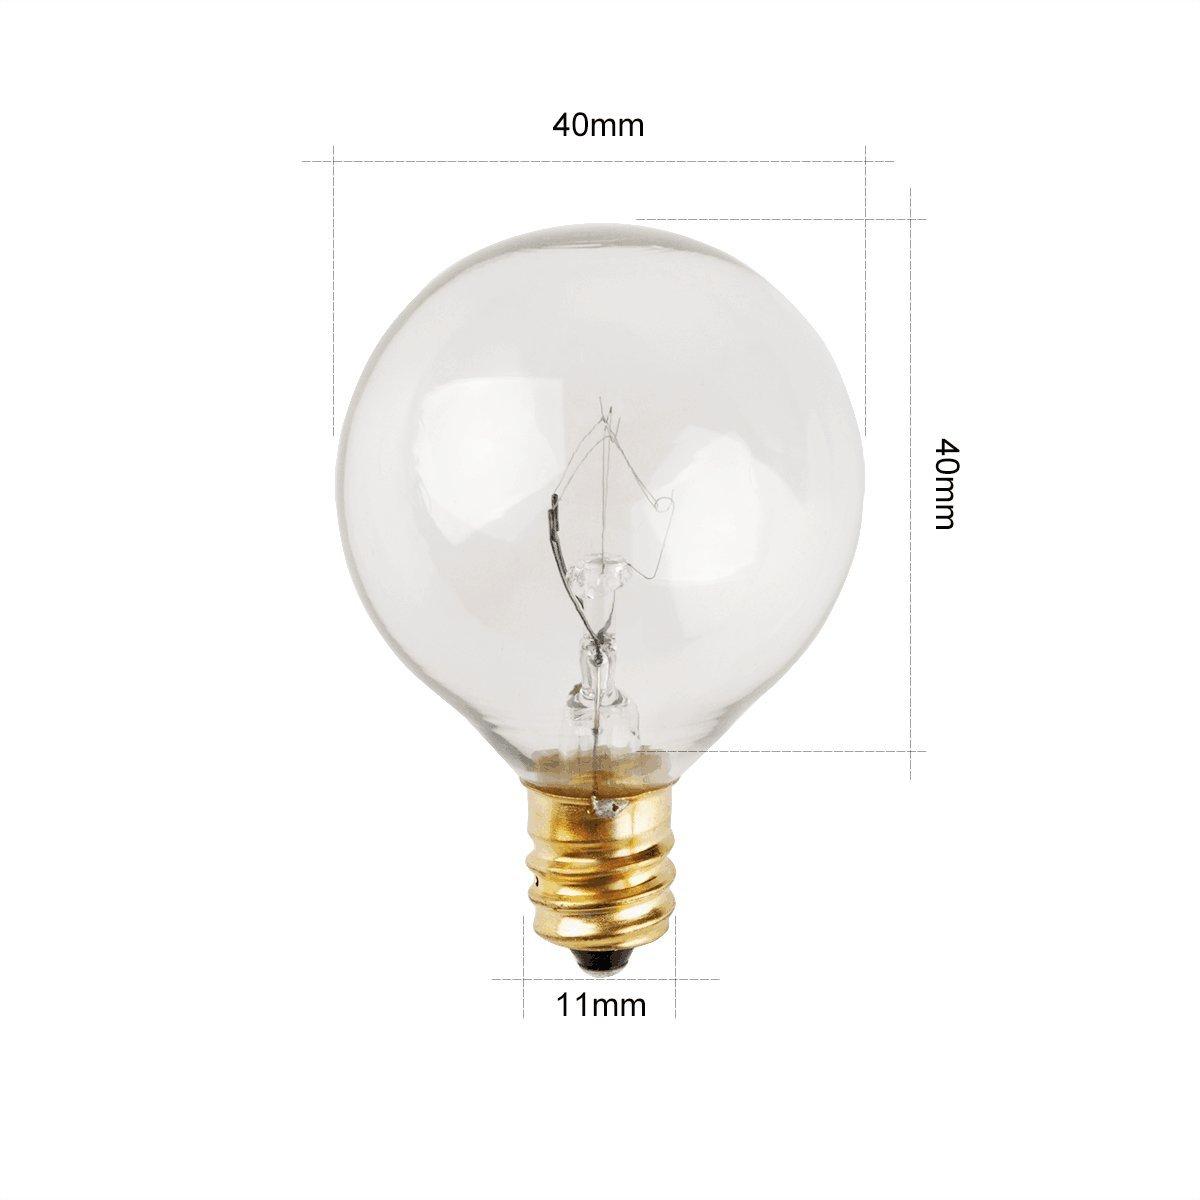 Zitrades Patio Lights G40 Bulbs 25pcs 5 Watts Clear Glass Globe Light Bulbs For